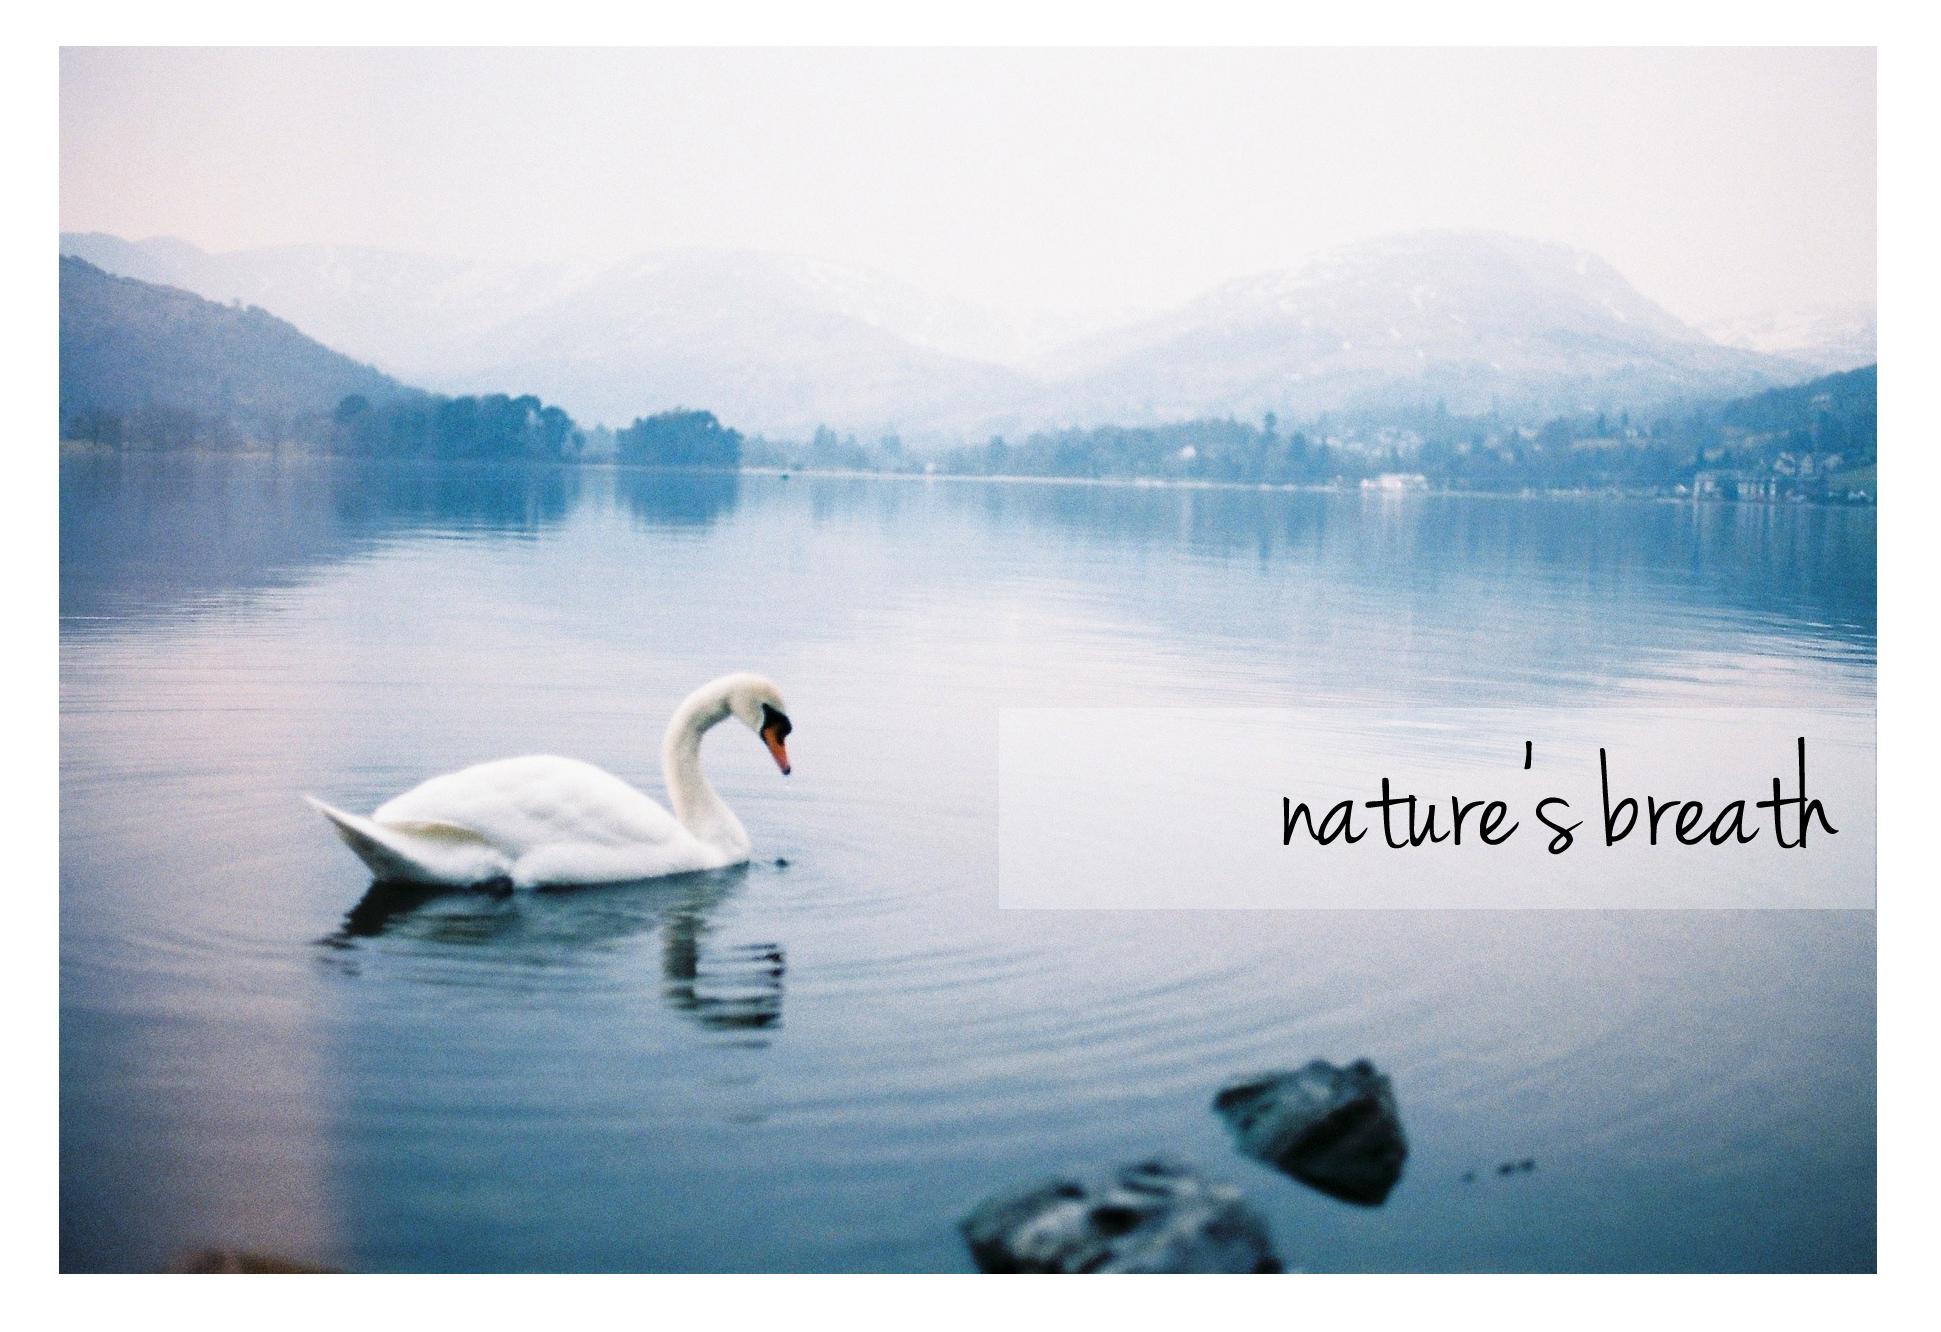 naturesbreath